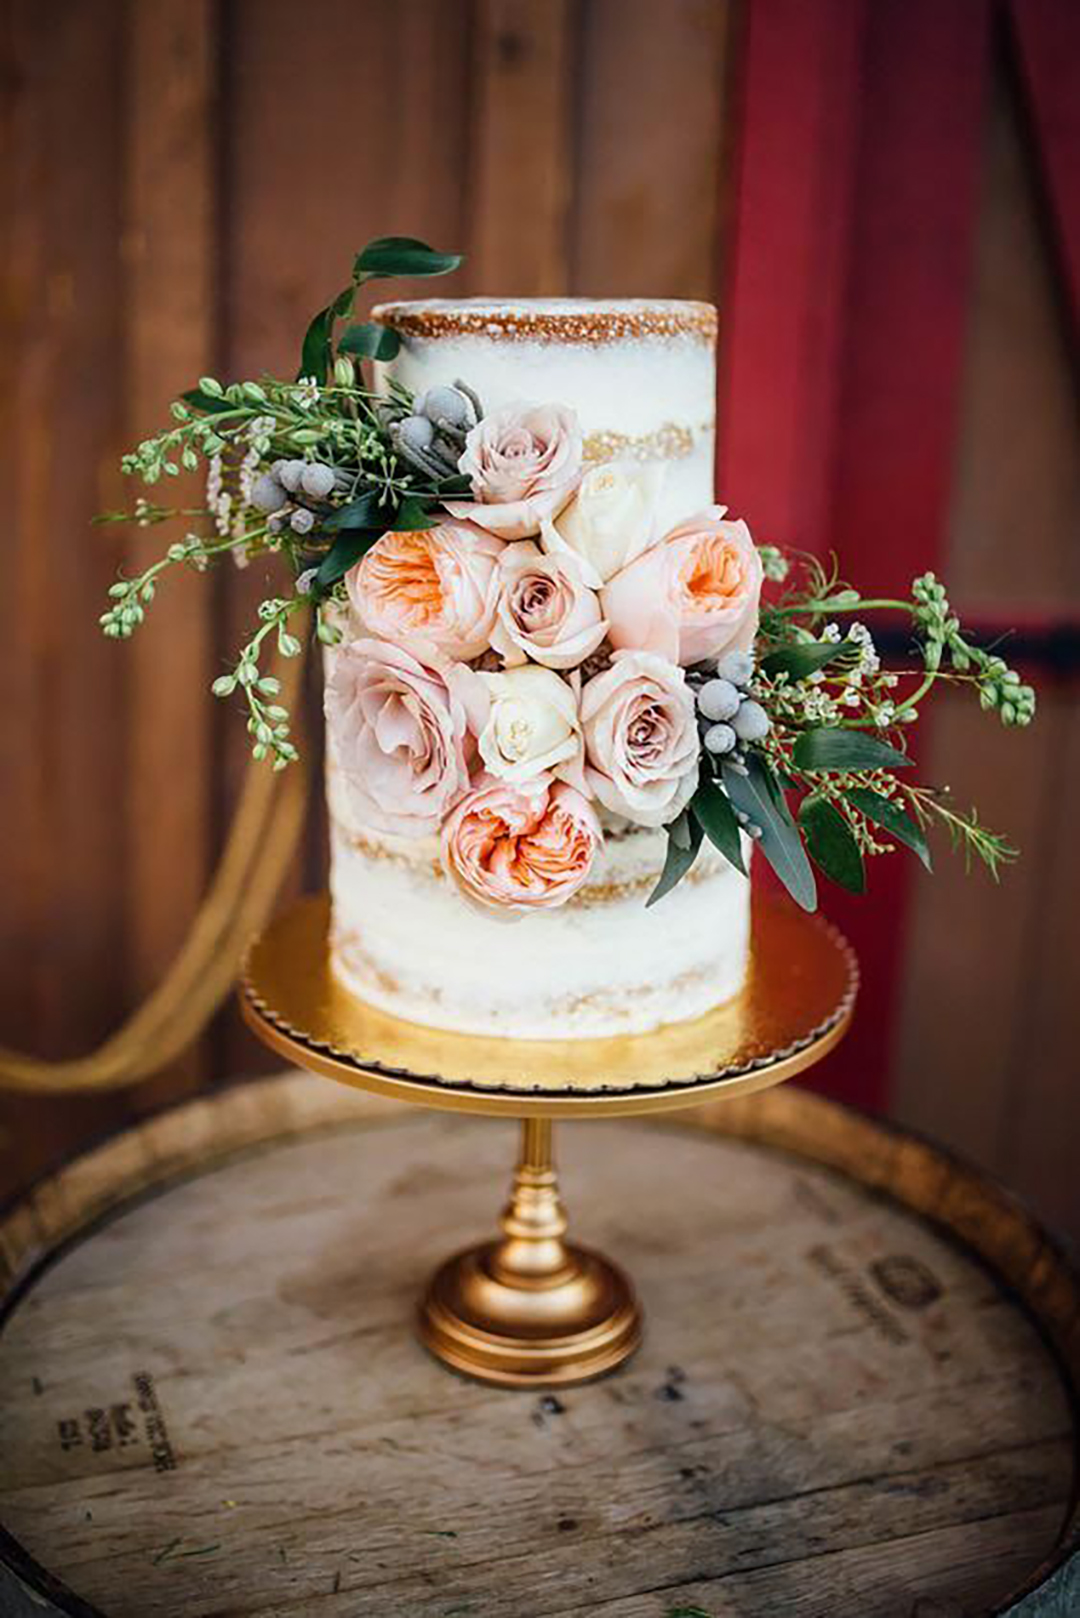 Opulent-Treasures-Plain-cake-stand-KateOlson-photo-avabakescakes.jpg